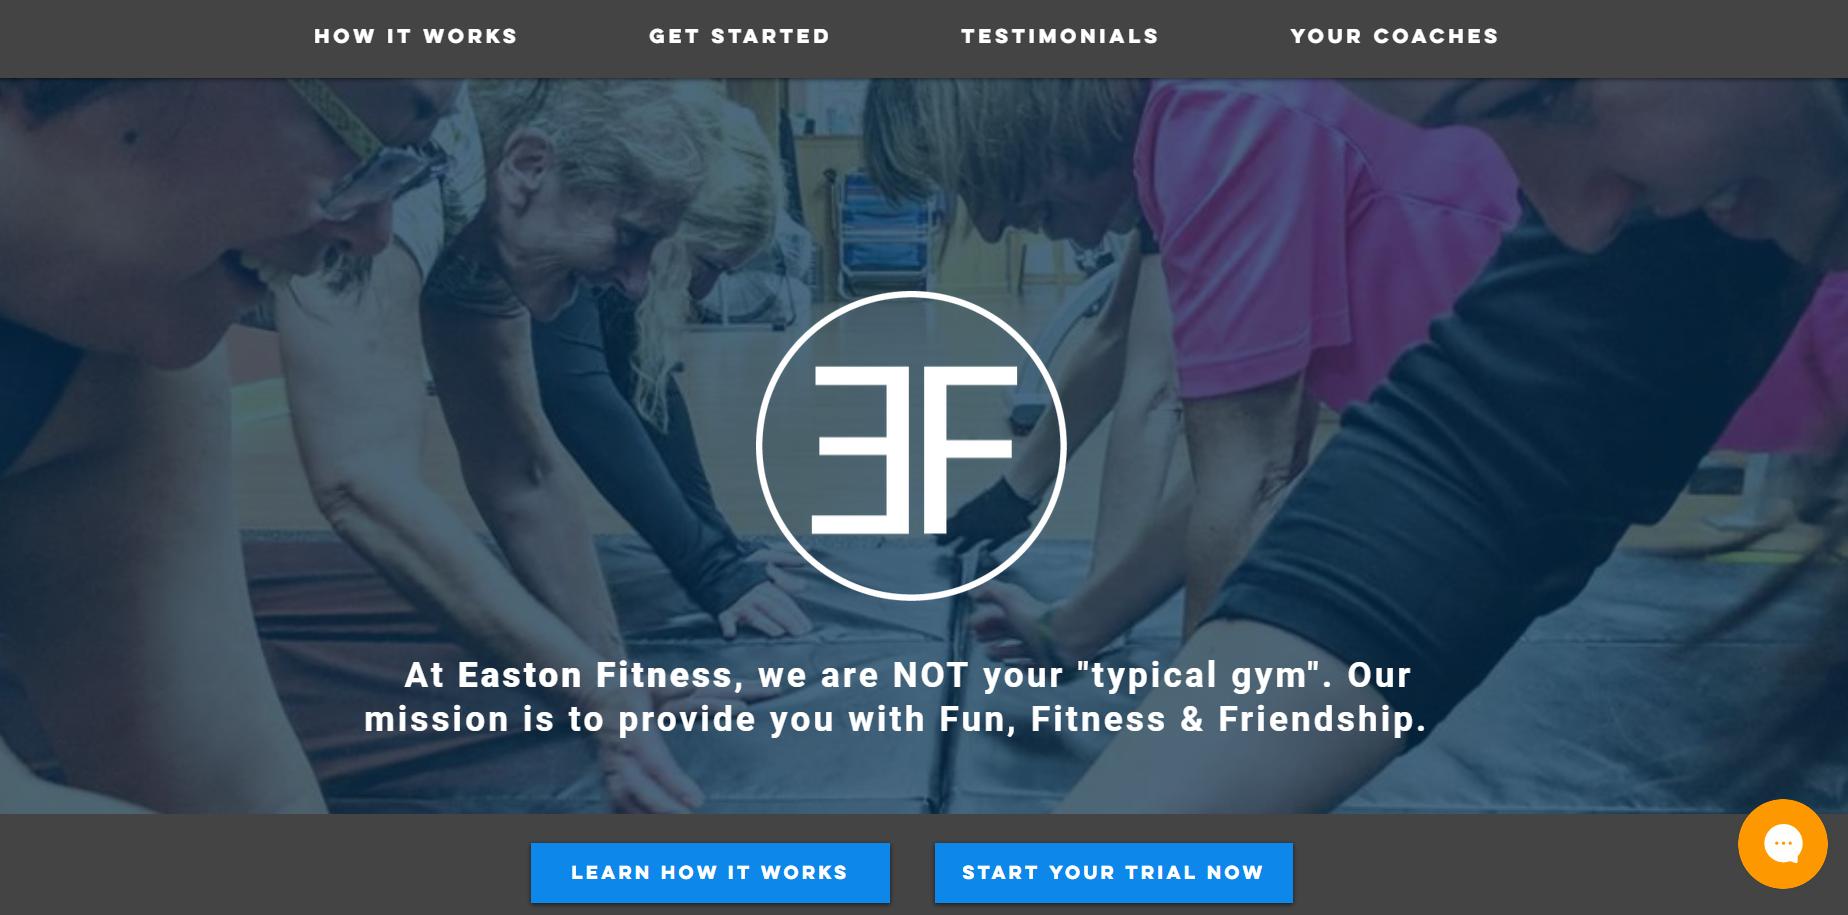 Easton Fitness